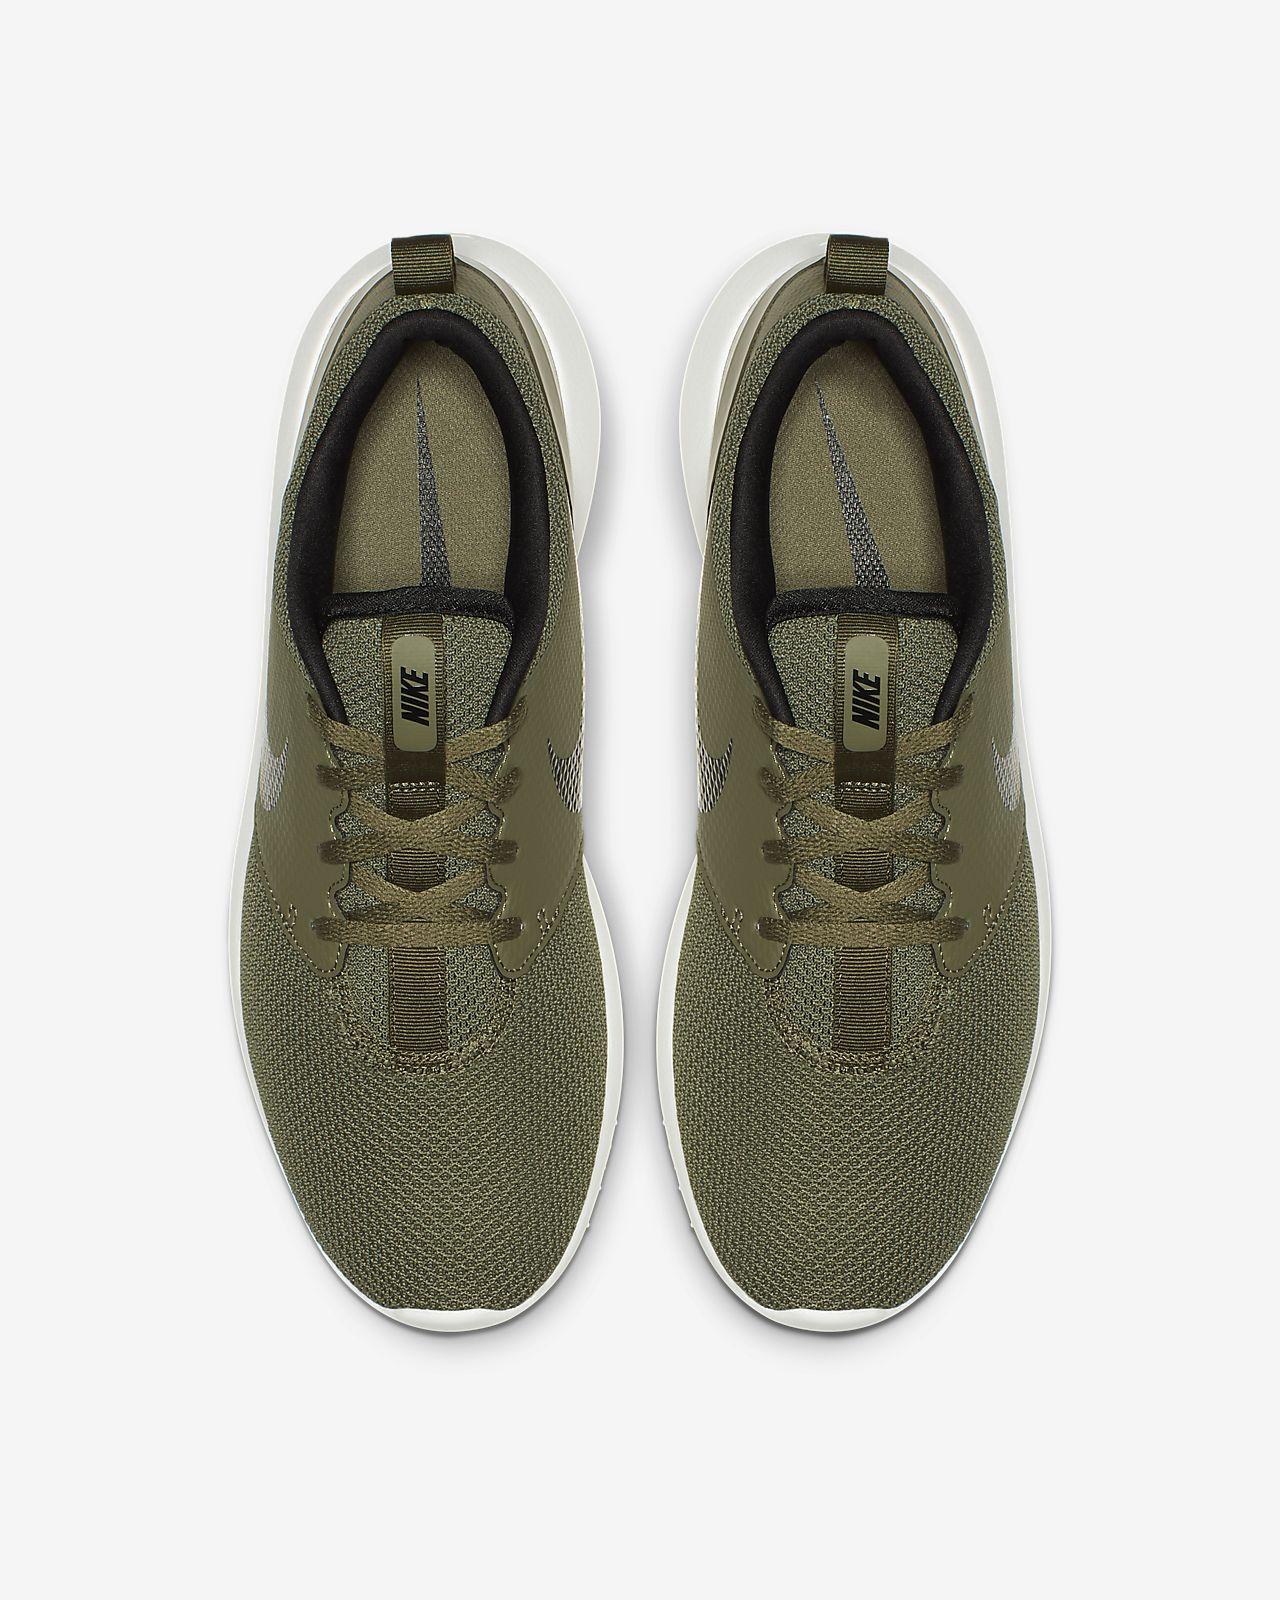 7e2a3e7b82a7 Nike Roshe G Men s Golf Shoe. Nike.com CA